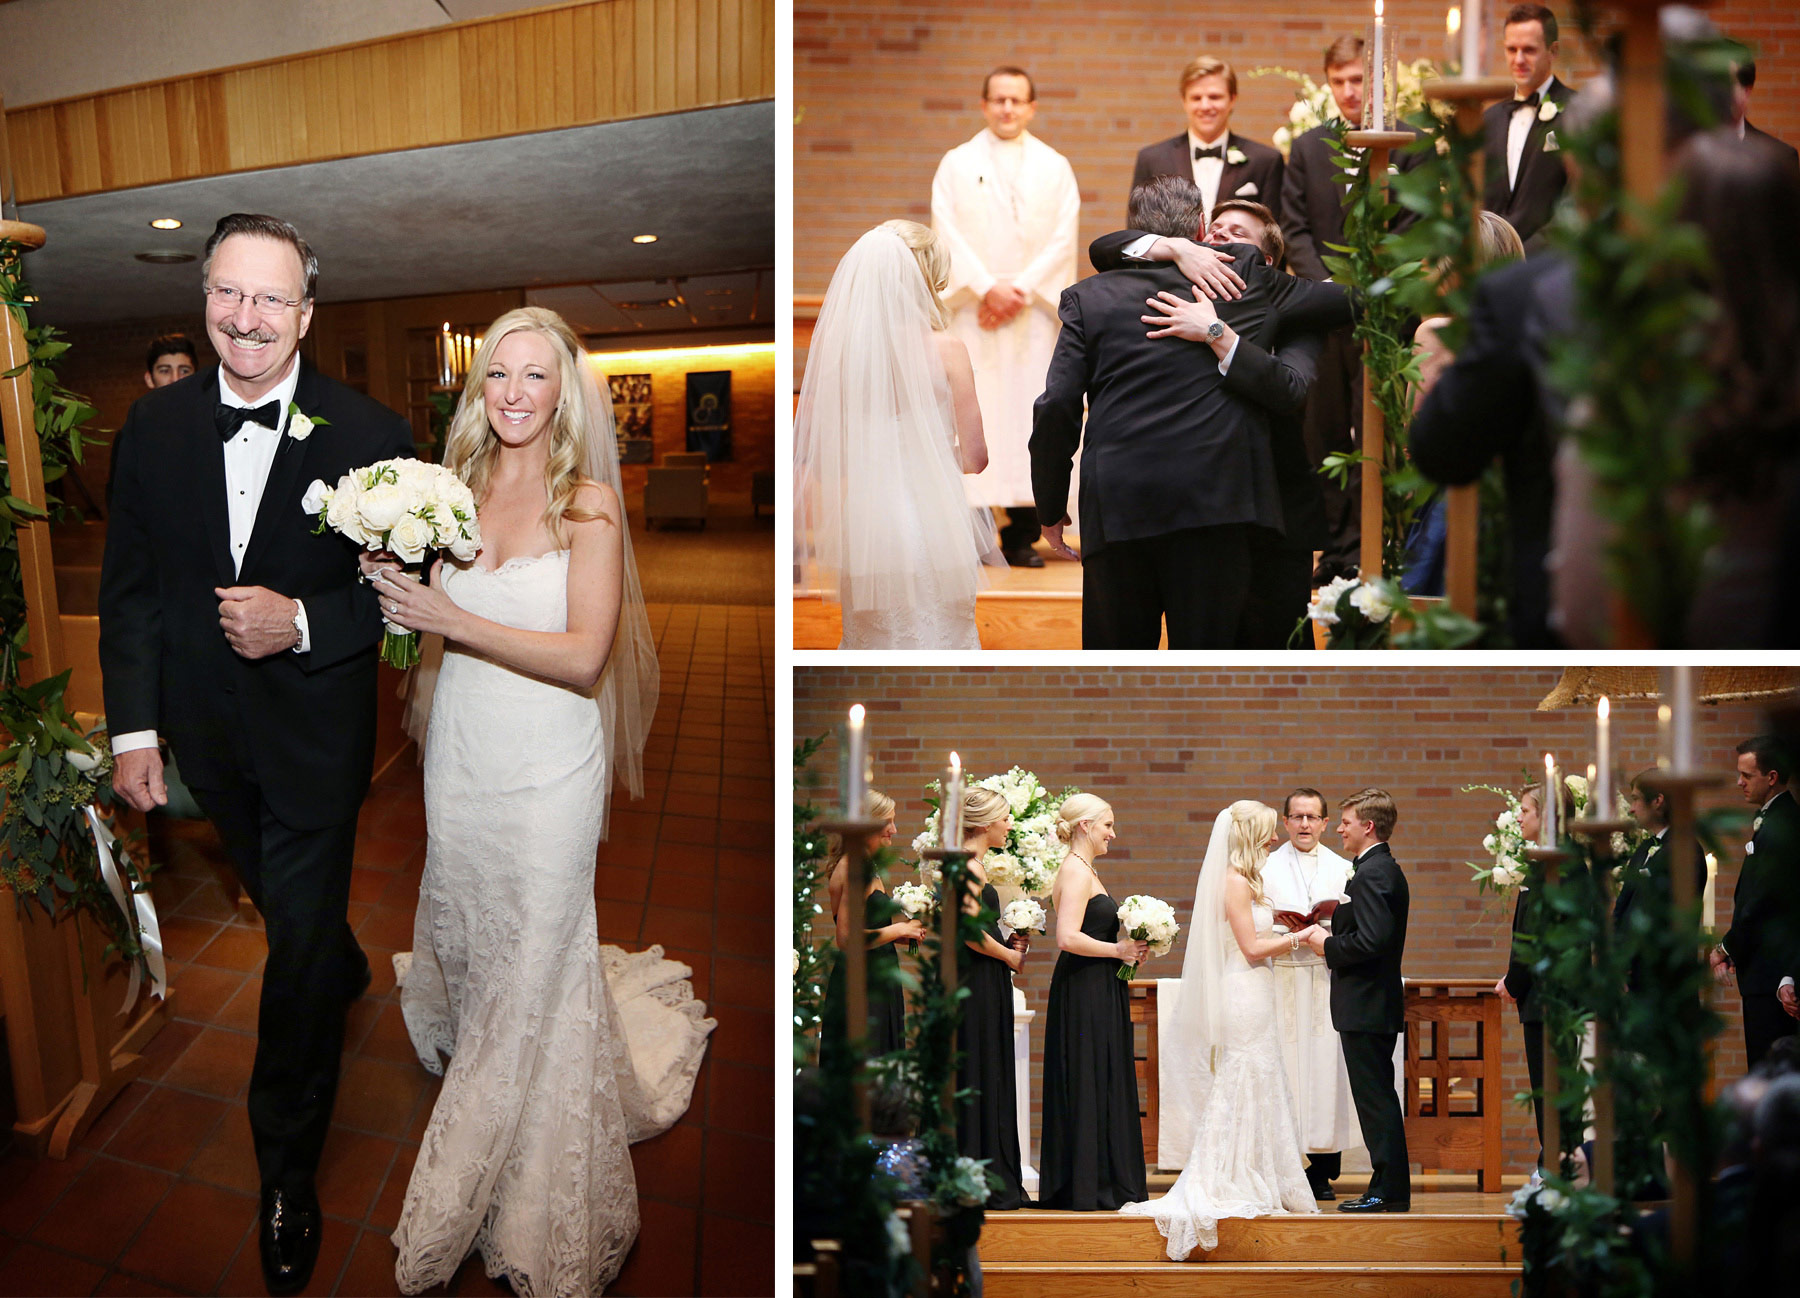 12-Minneapolis-Minnesota-Wedding-Photography-by-Vick-Photography-Ceremony--Normandale-Lutheran-Church-Caroline-and-J.jpg